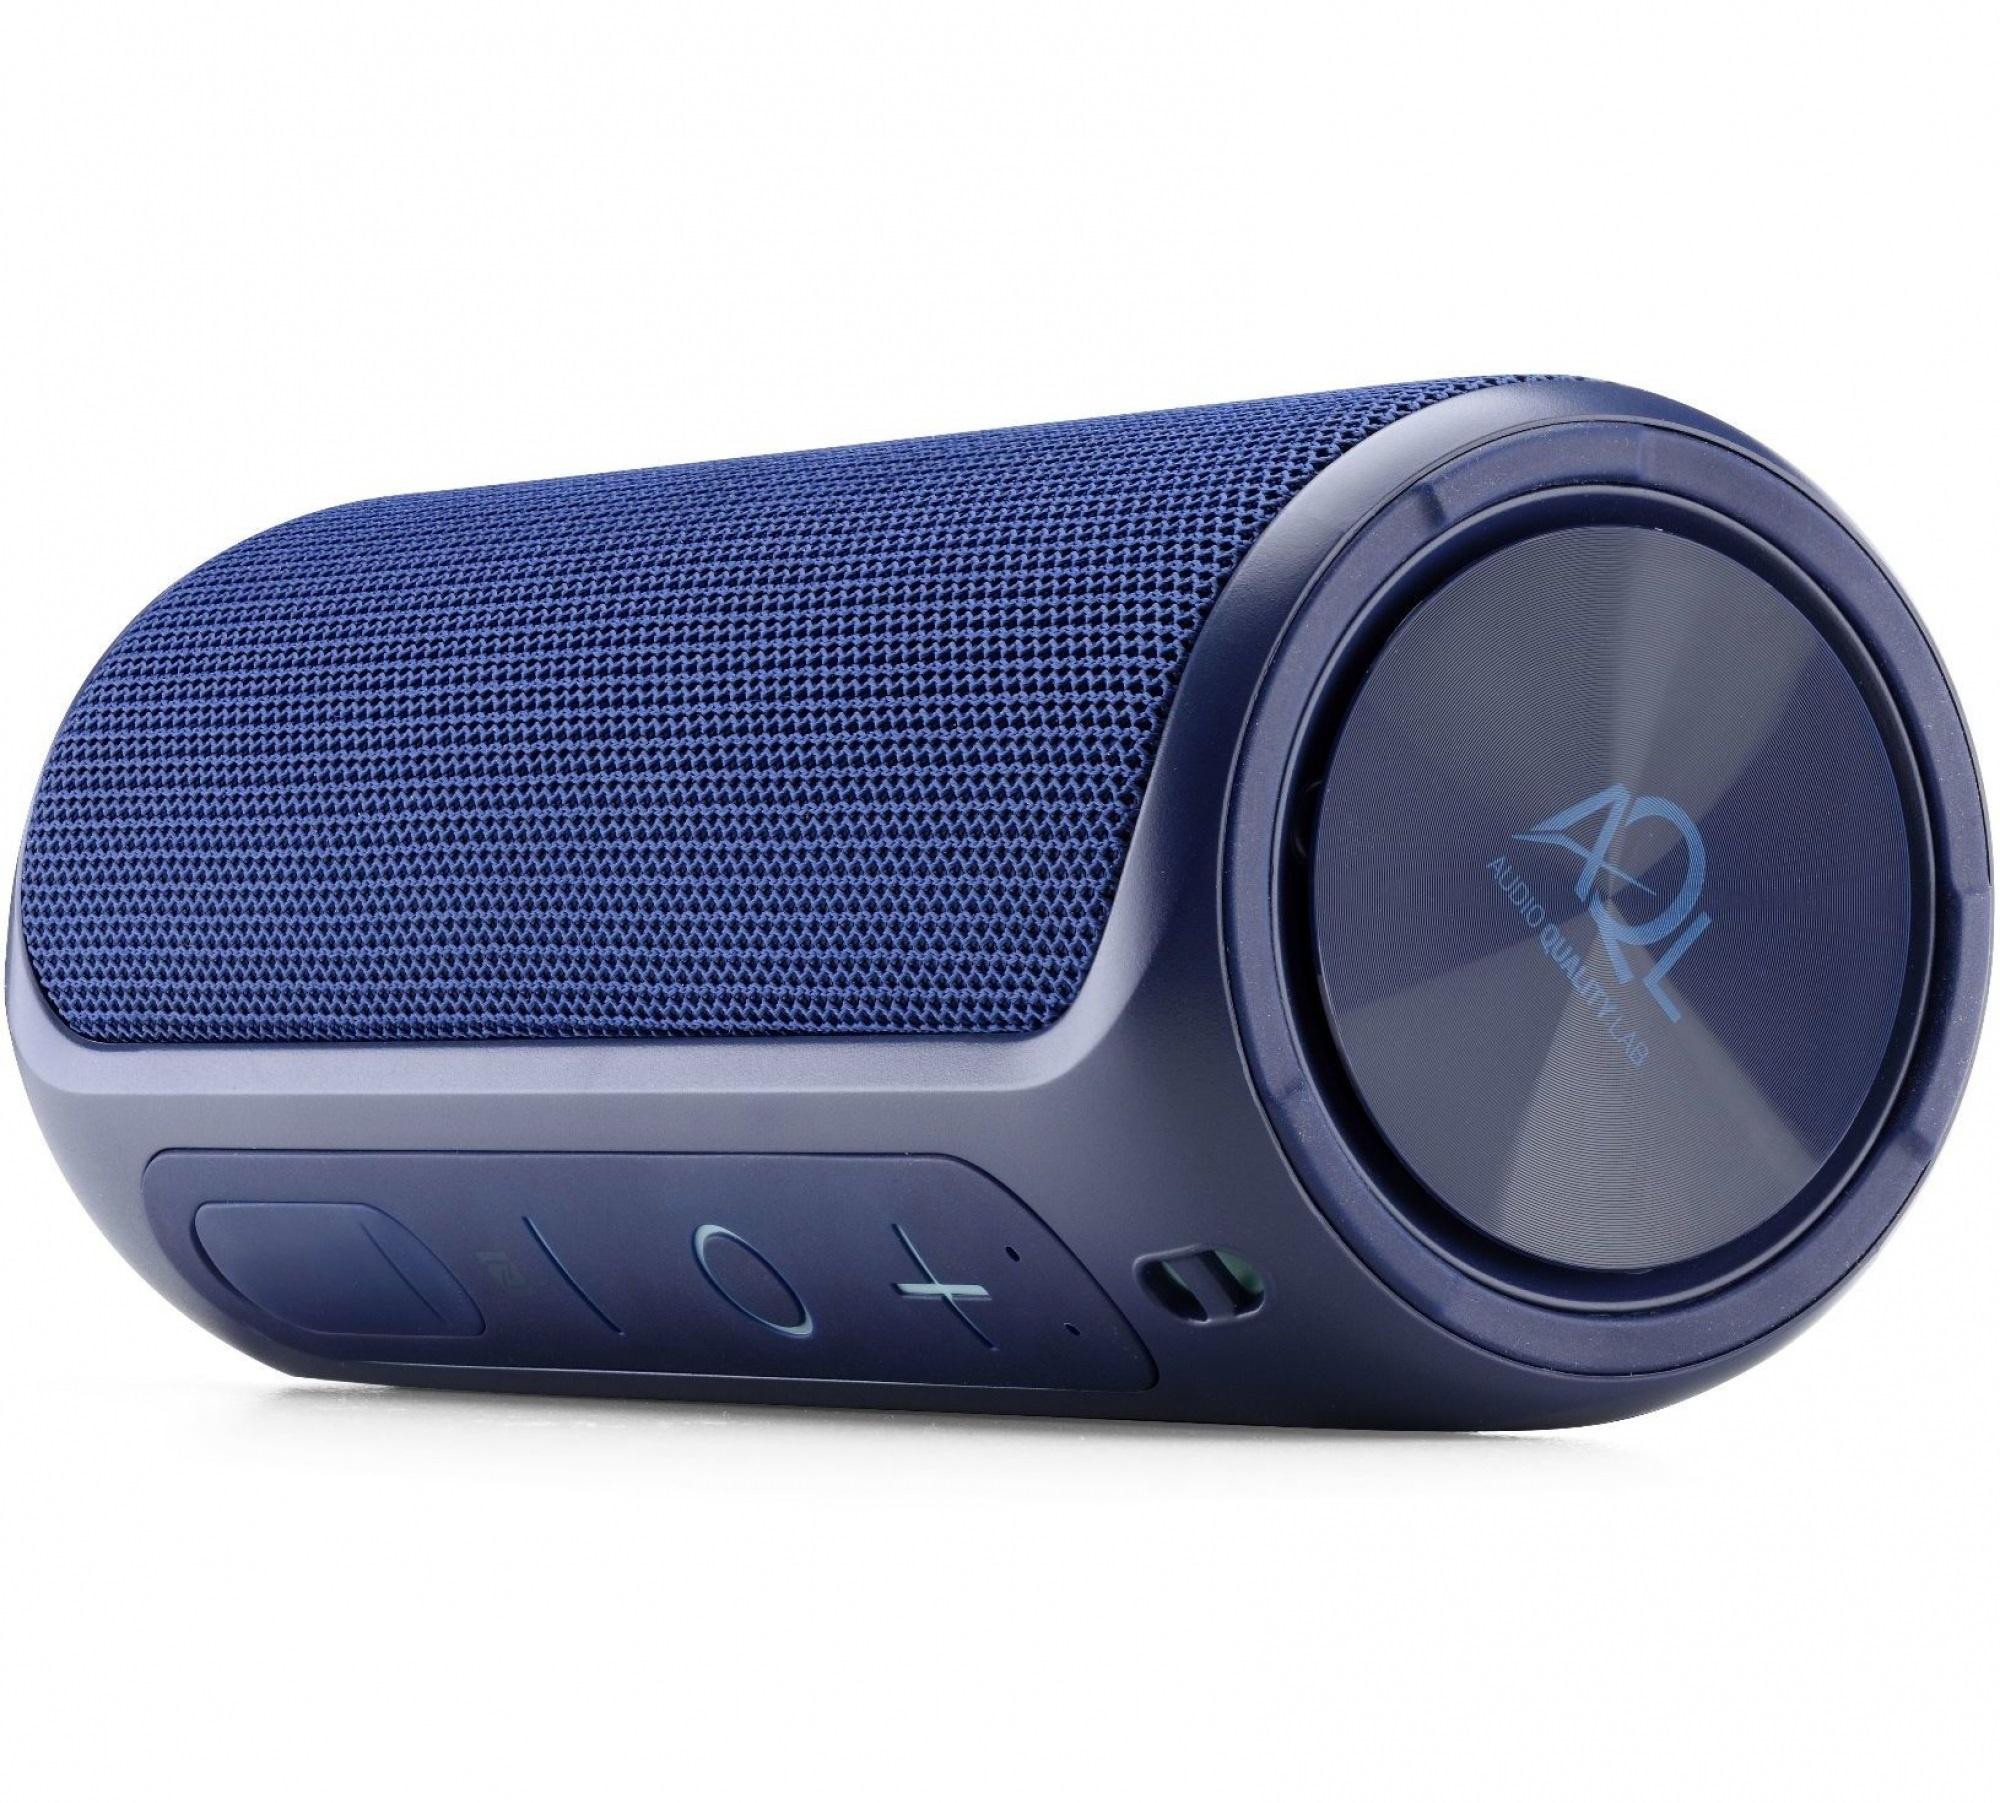 Genuine KITSOUND Cube Portable Wireless Bluetooth Smartphones//MP4 Speaker